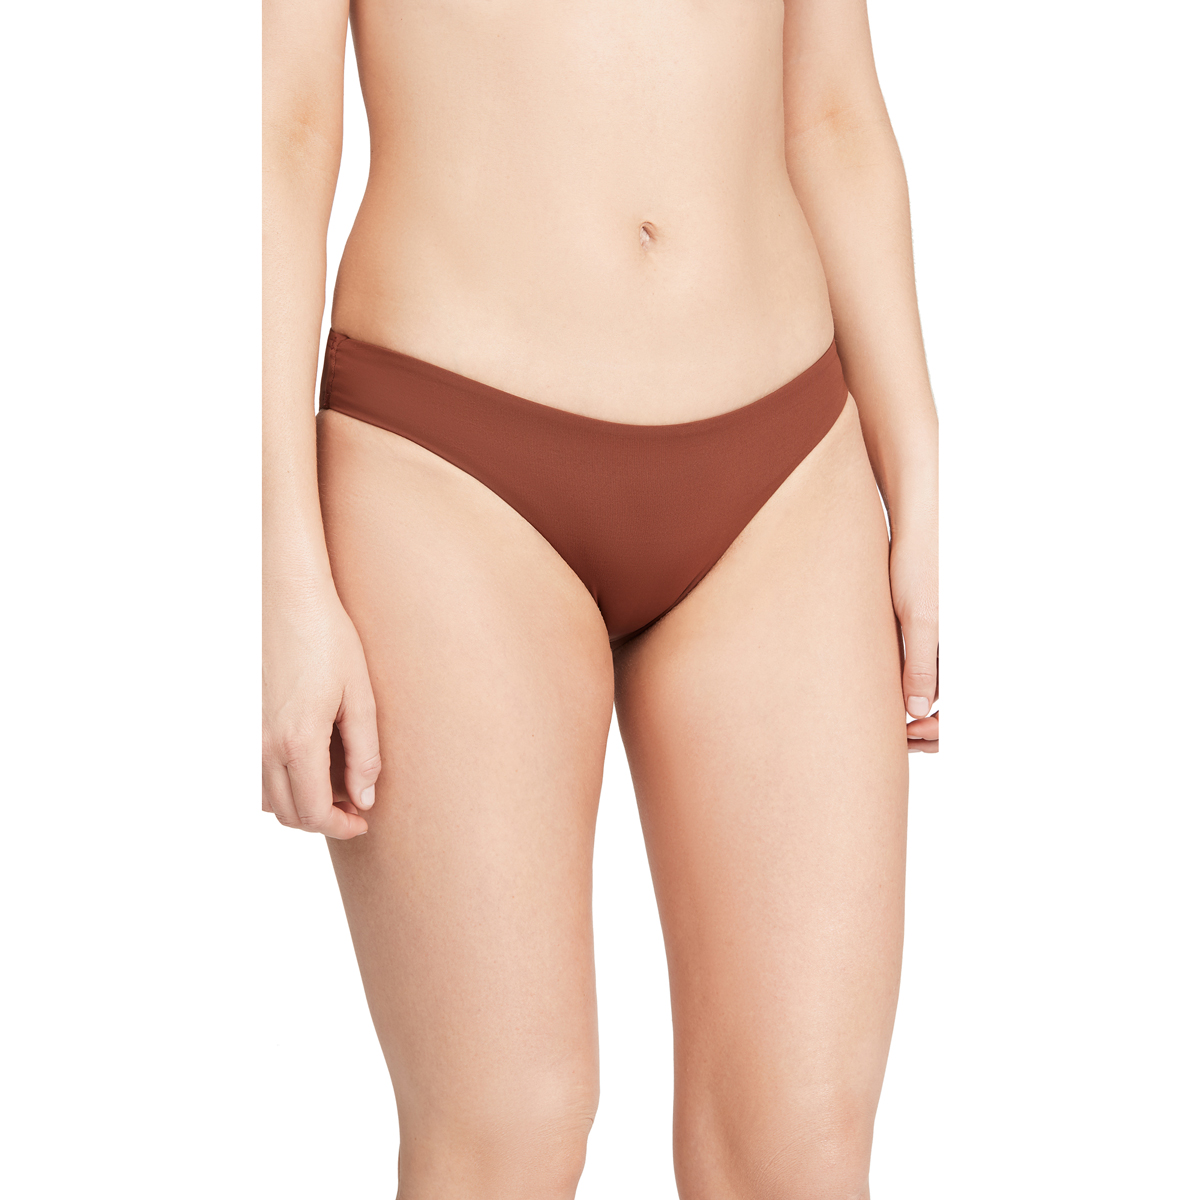 lspace sandy bikini bottoms shop